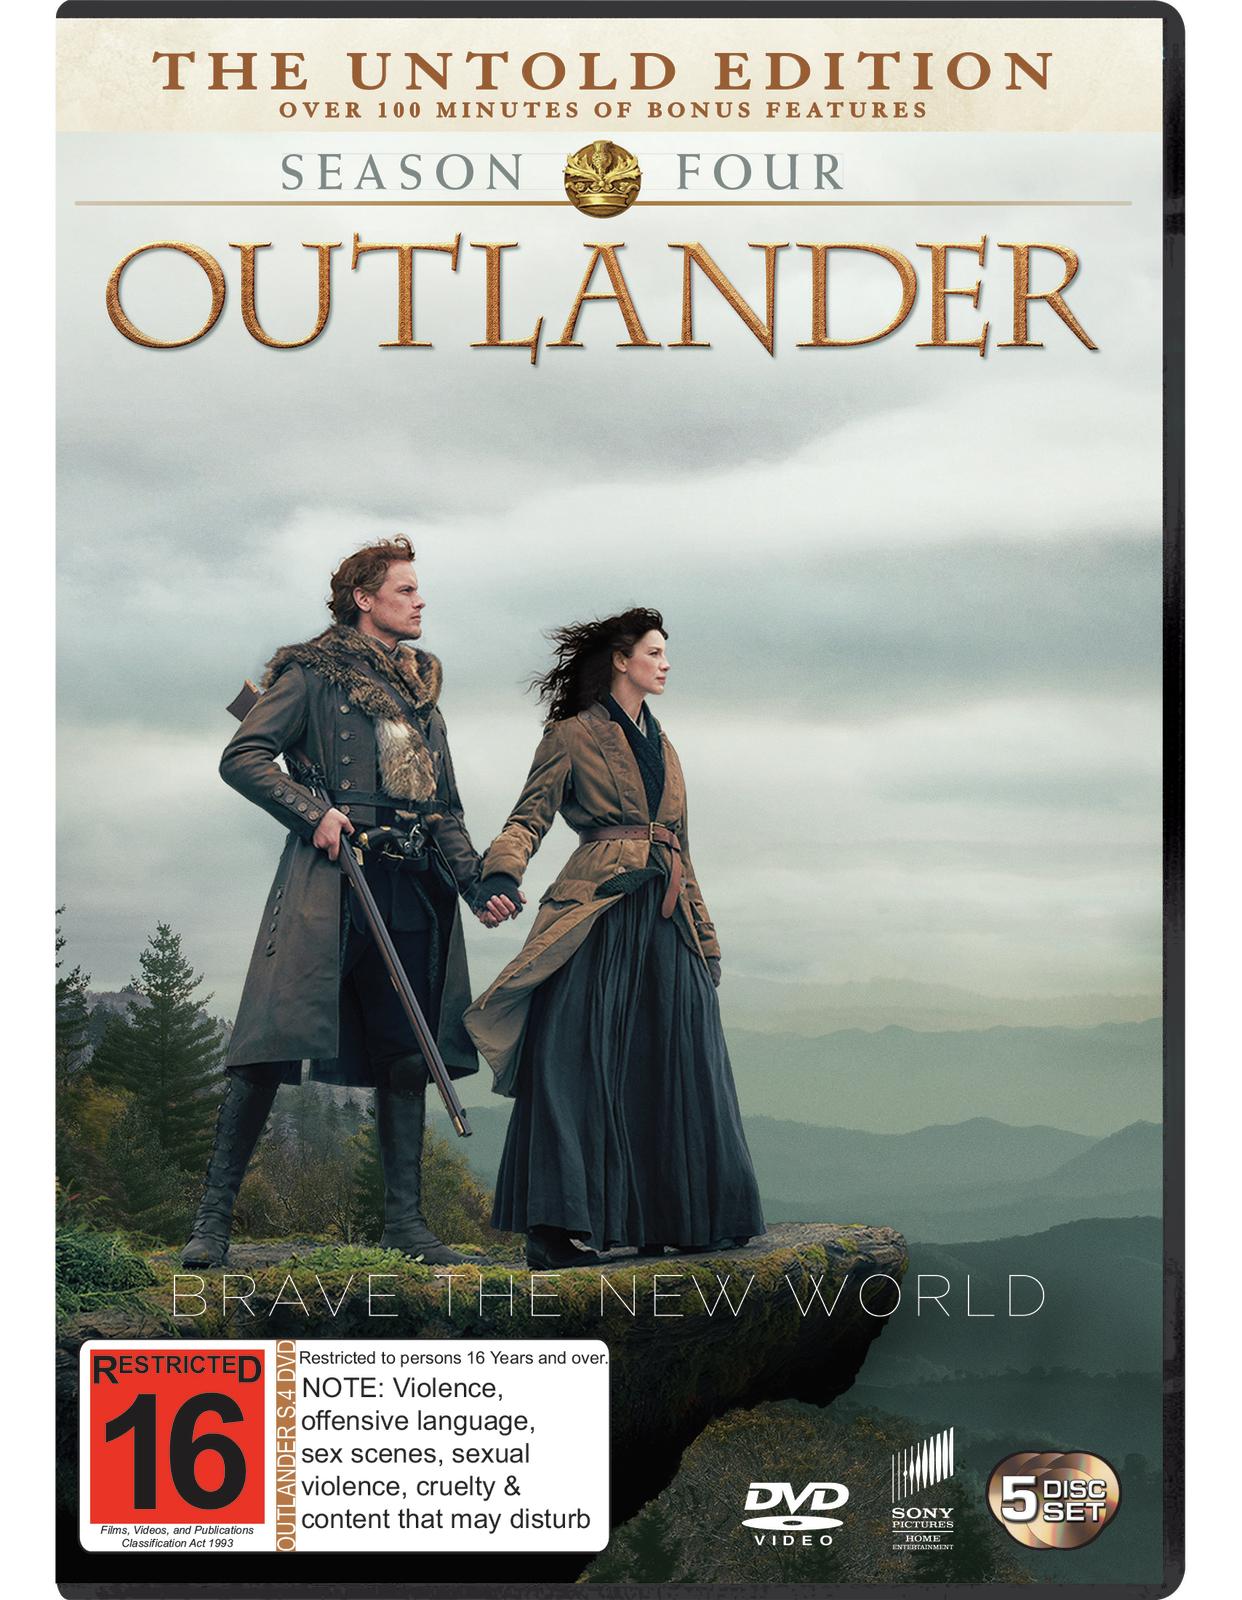 Outlander Season 4 on DVD image